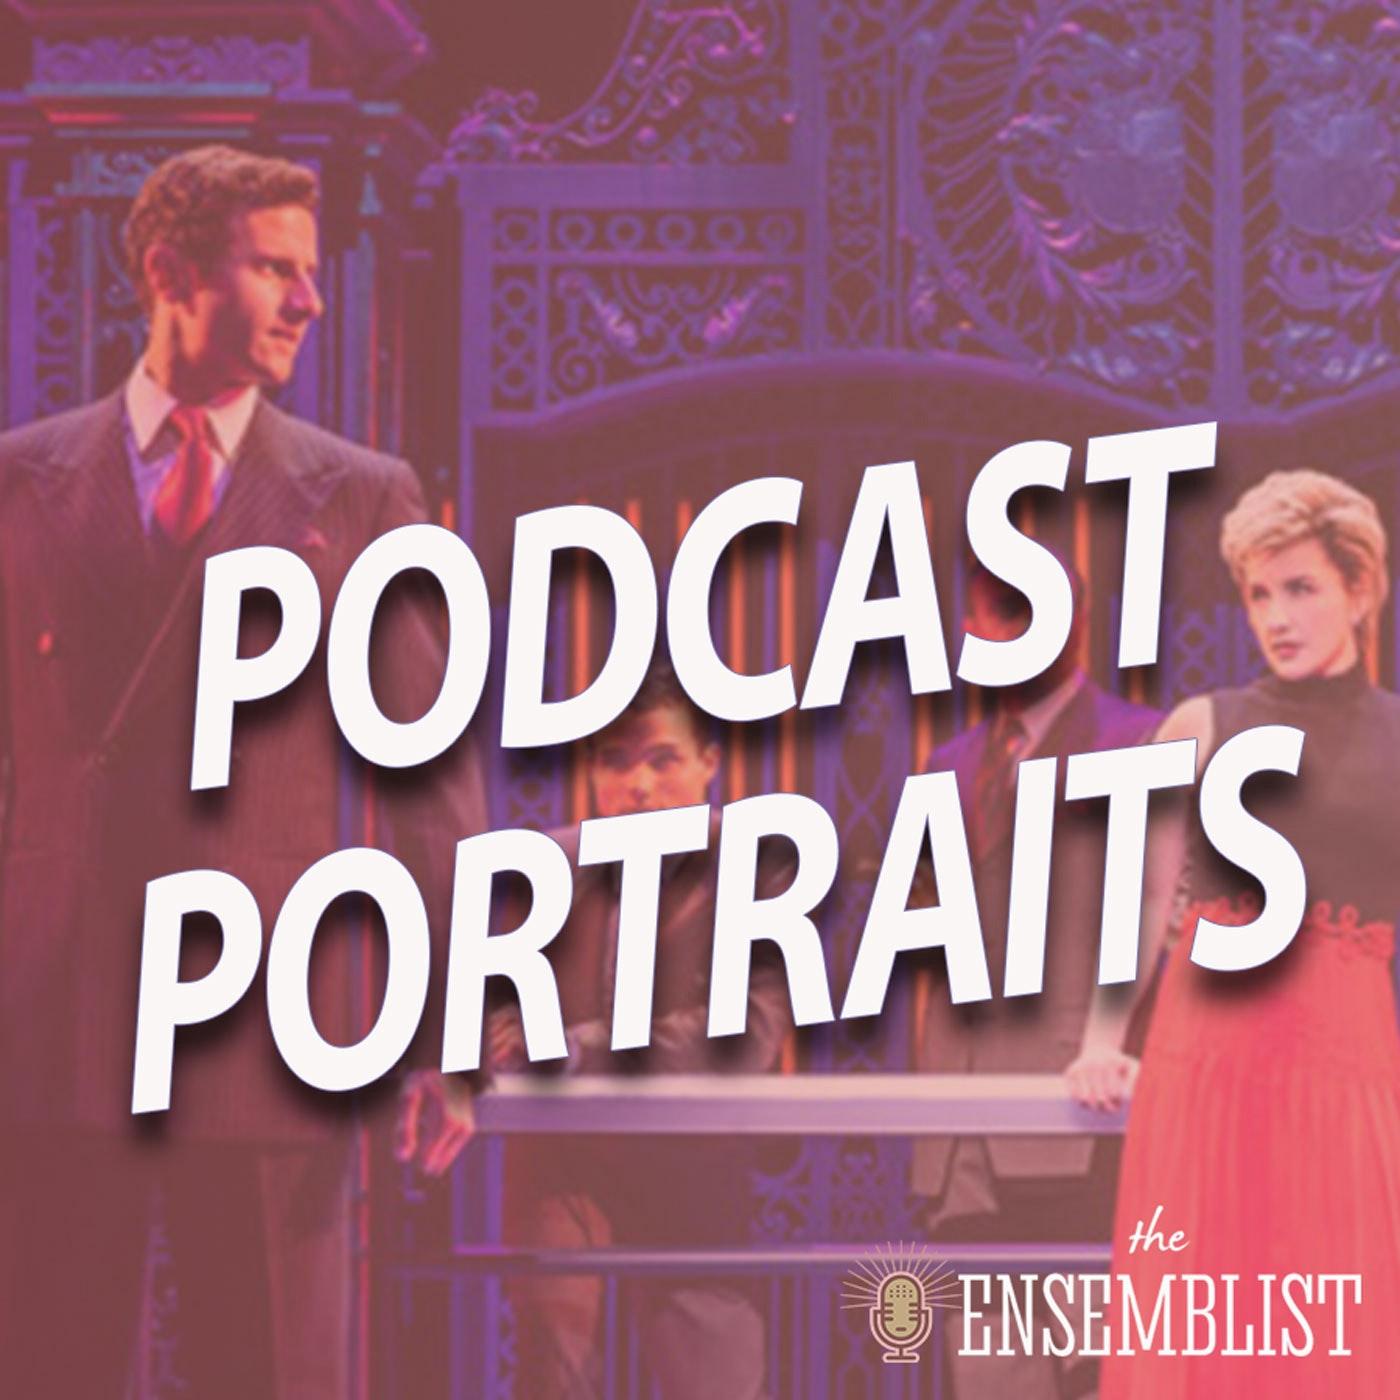 #495 - Podcast Portraits (feat. André Jordan)